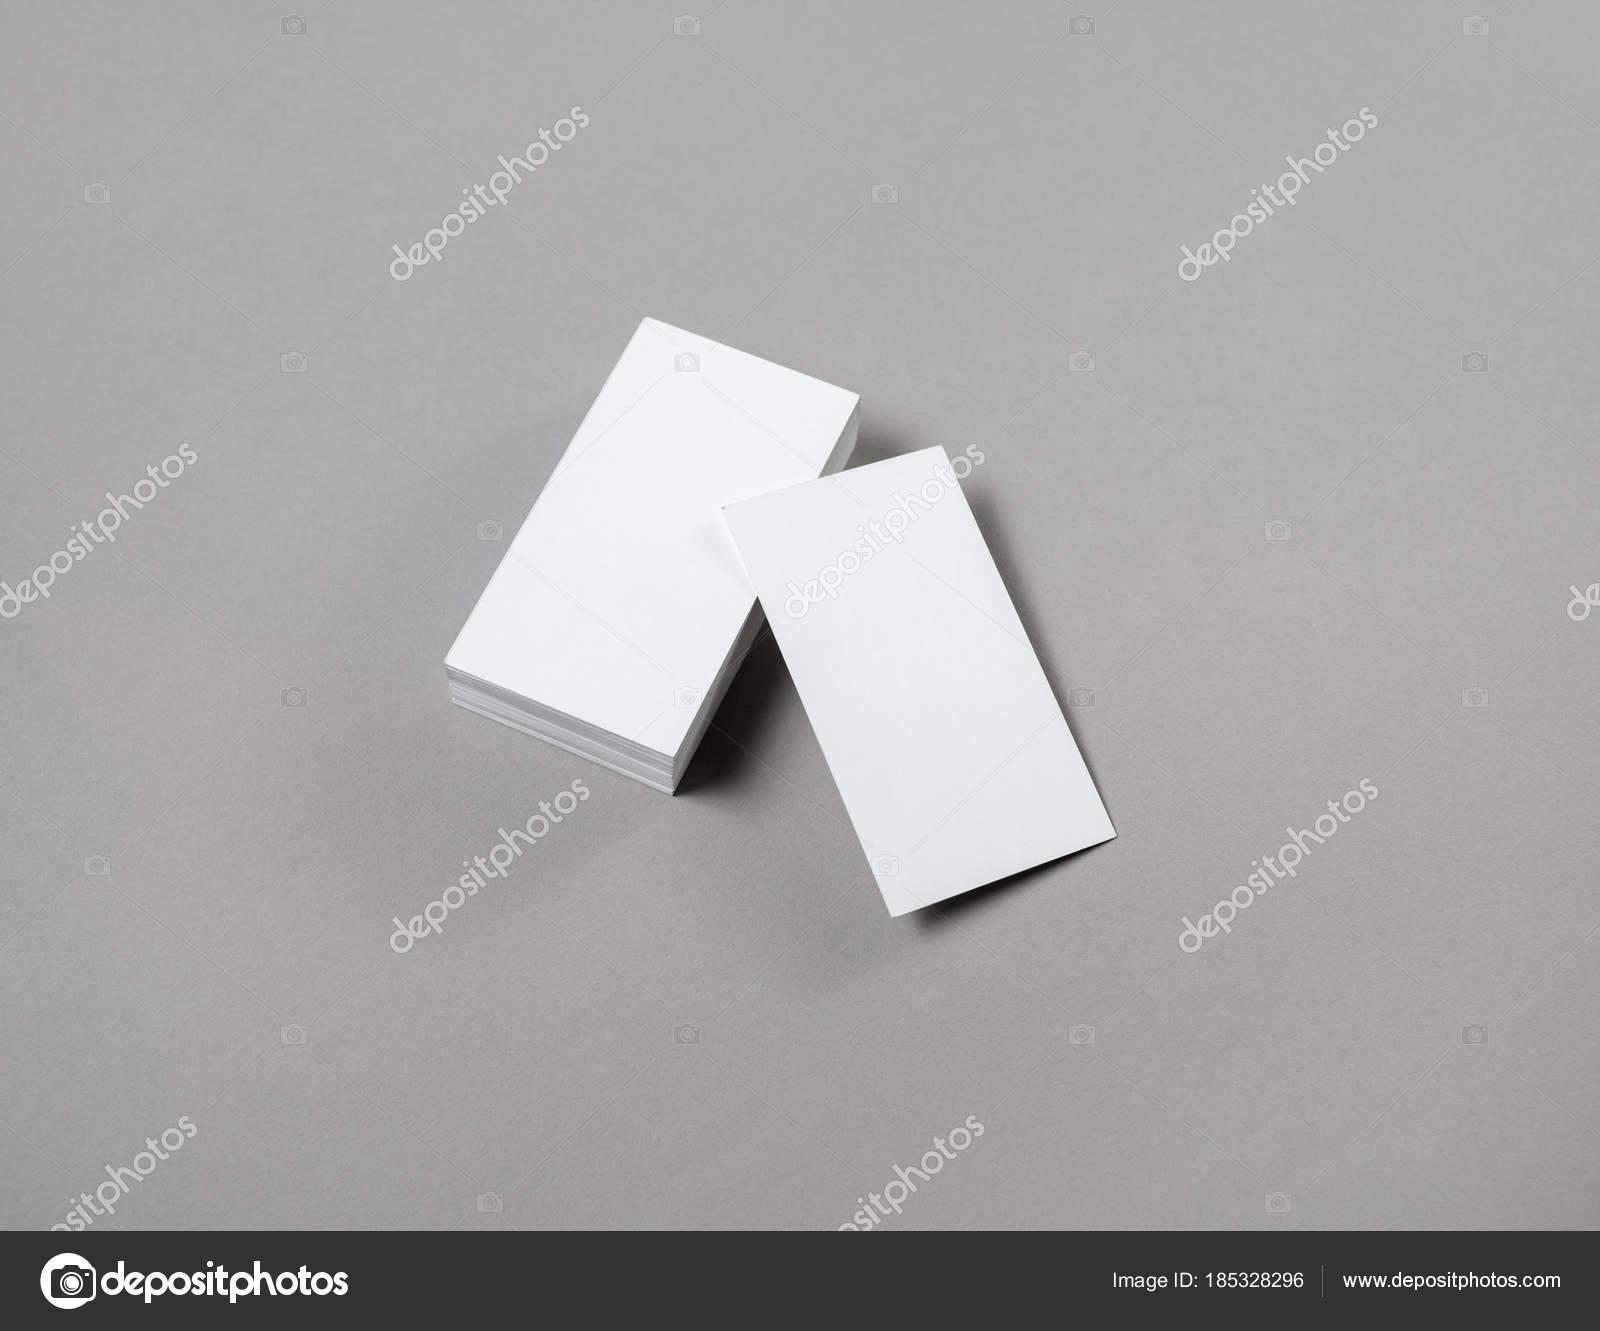 Blank business cards — Stock Photo © Veresovich #185328296